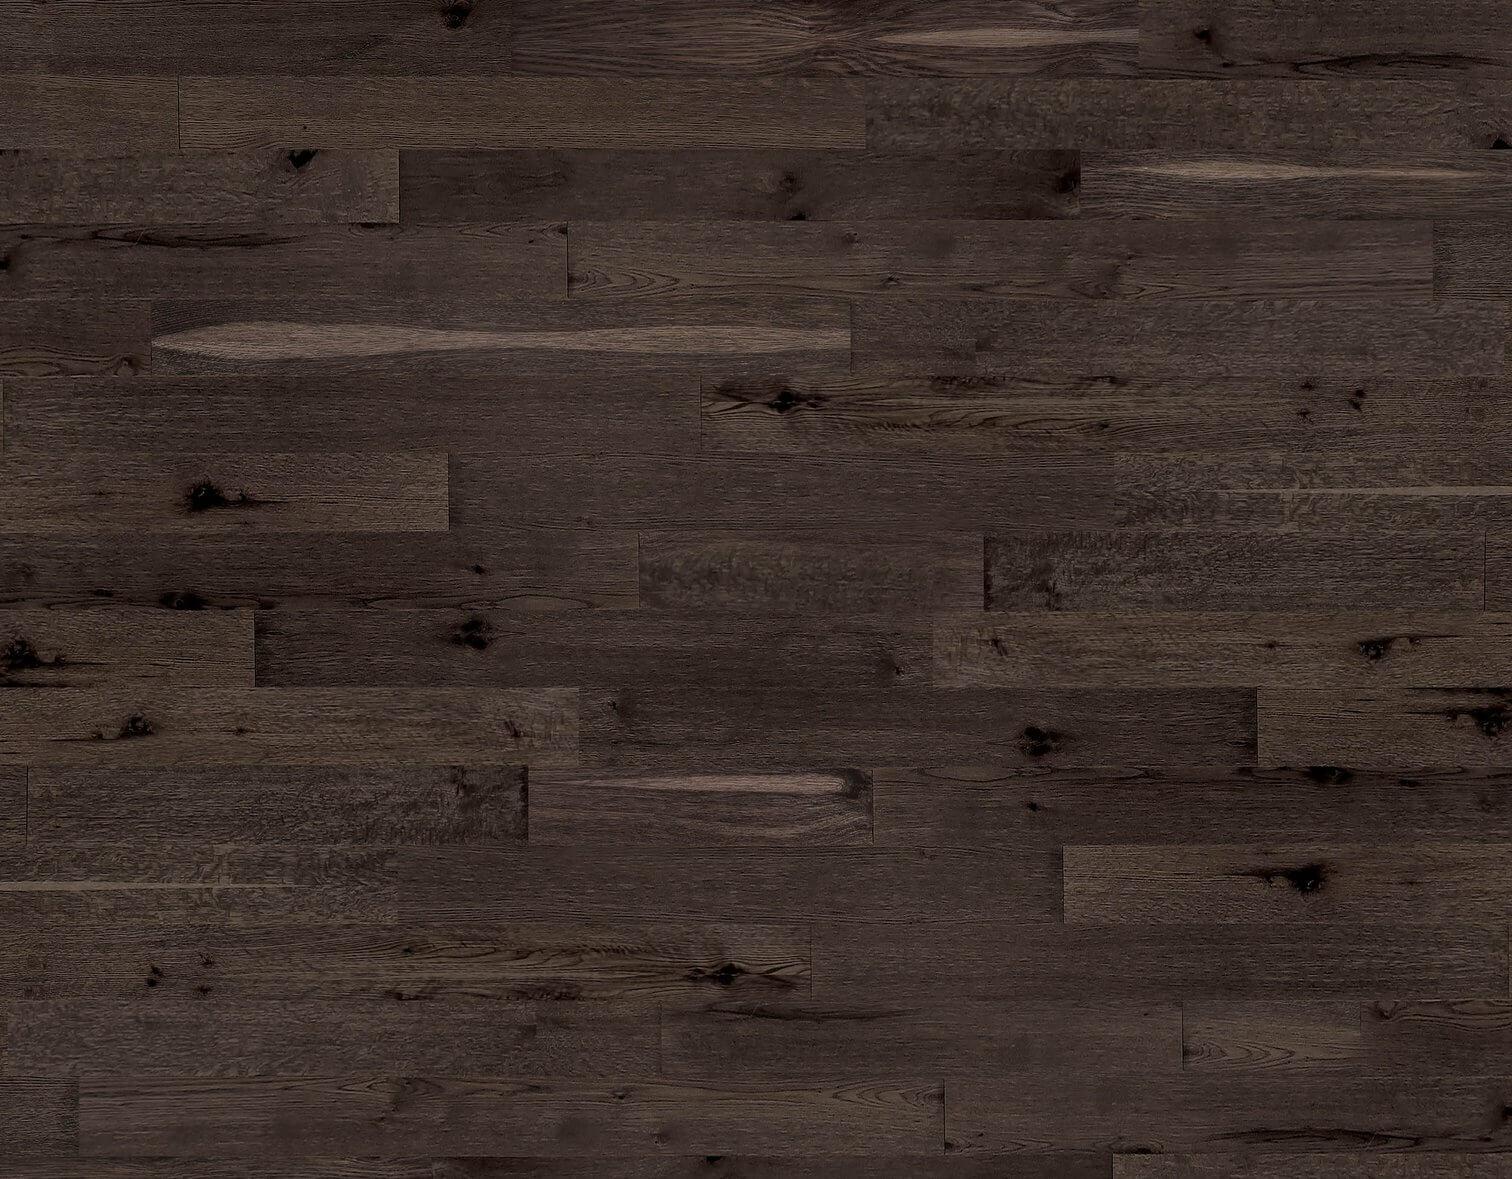 Dusk Originals Hardwood Plank | Wallplanks